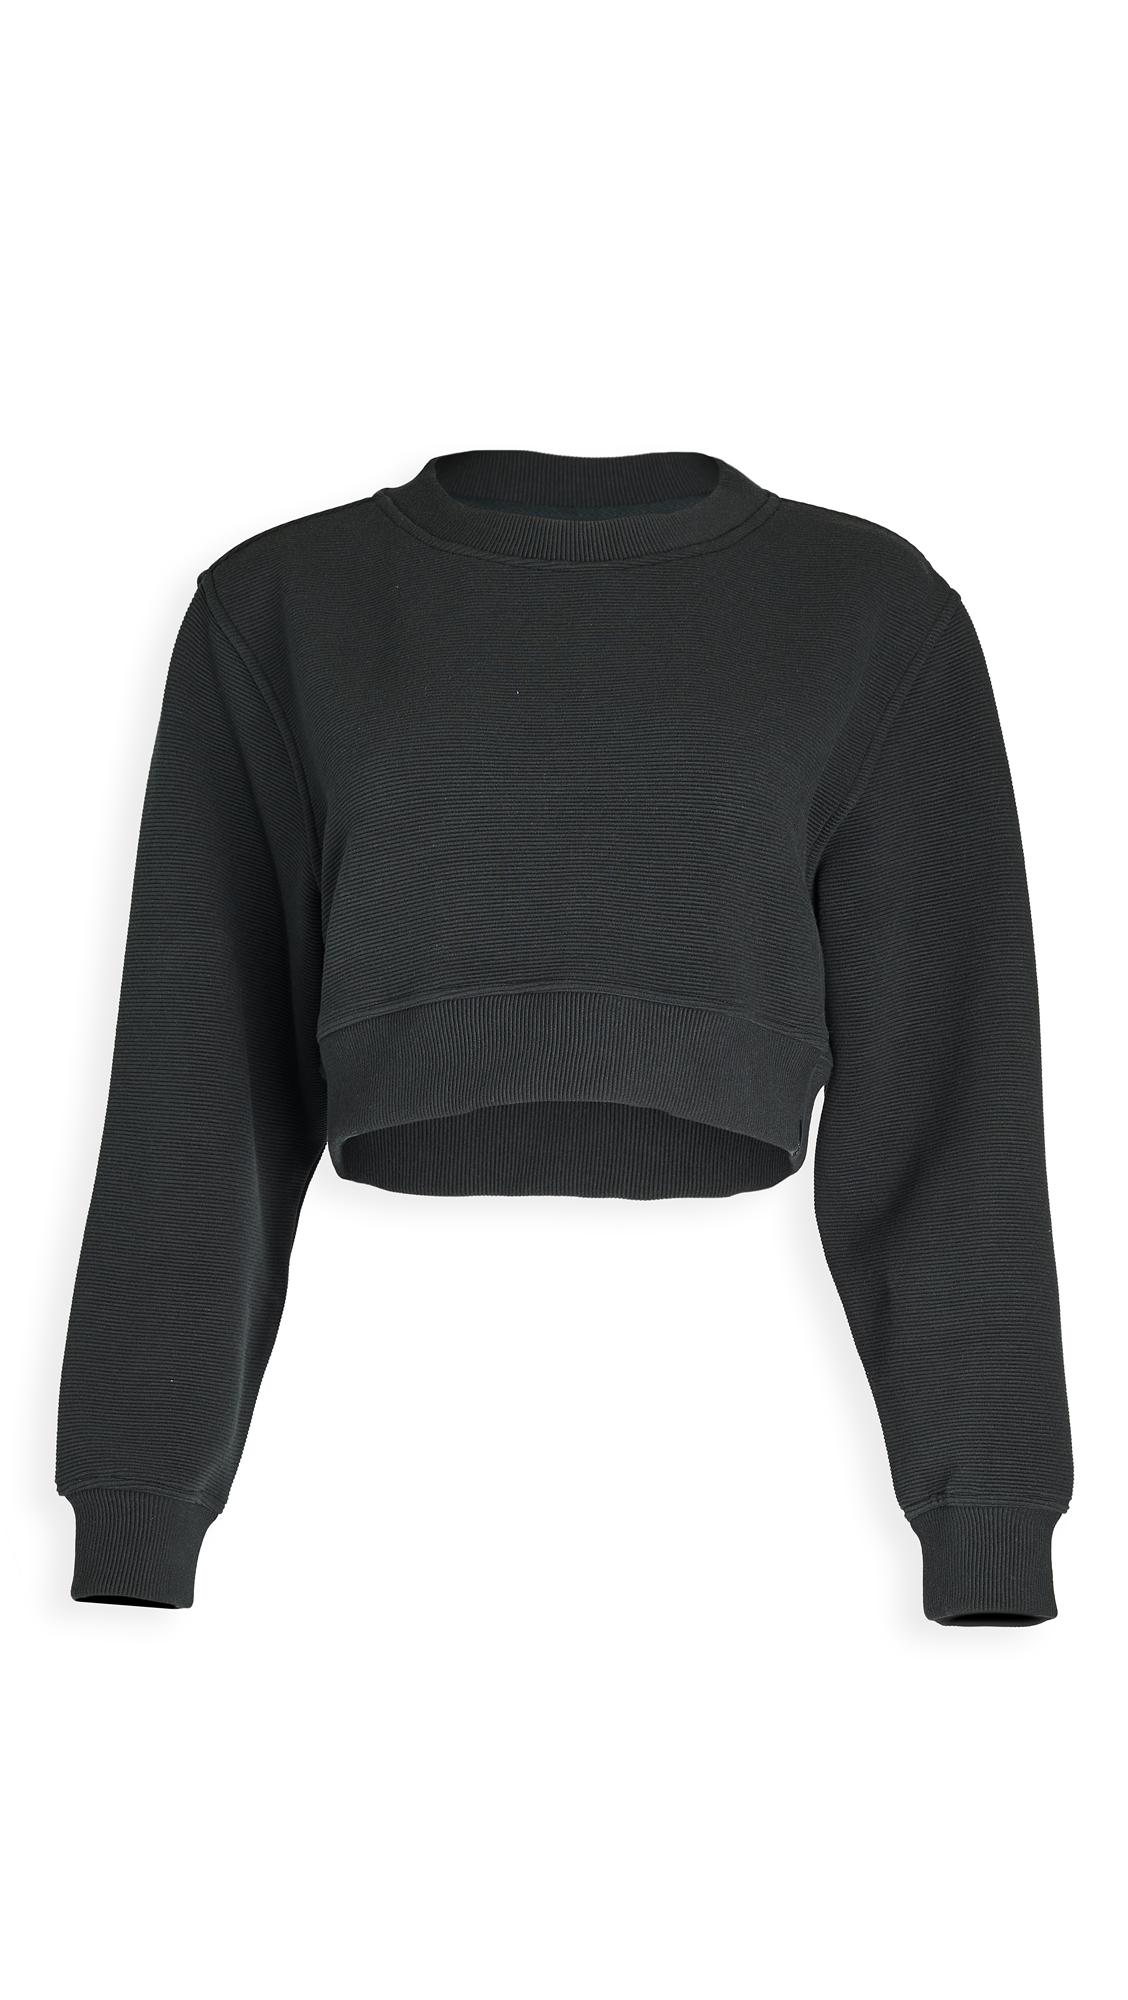 Varley Albata Sweatshirt